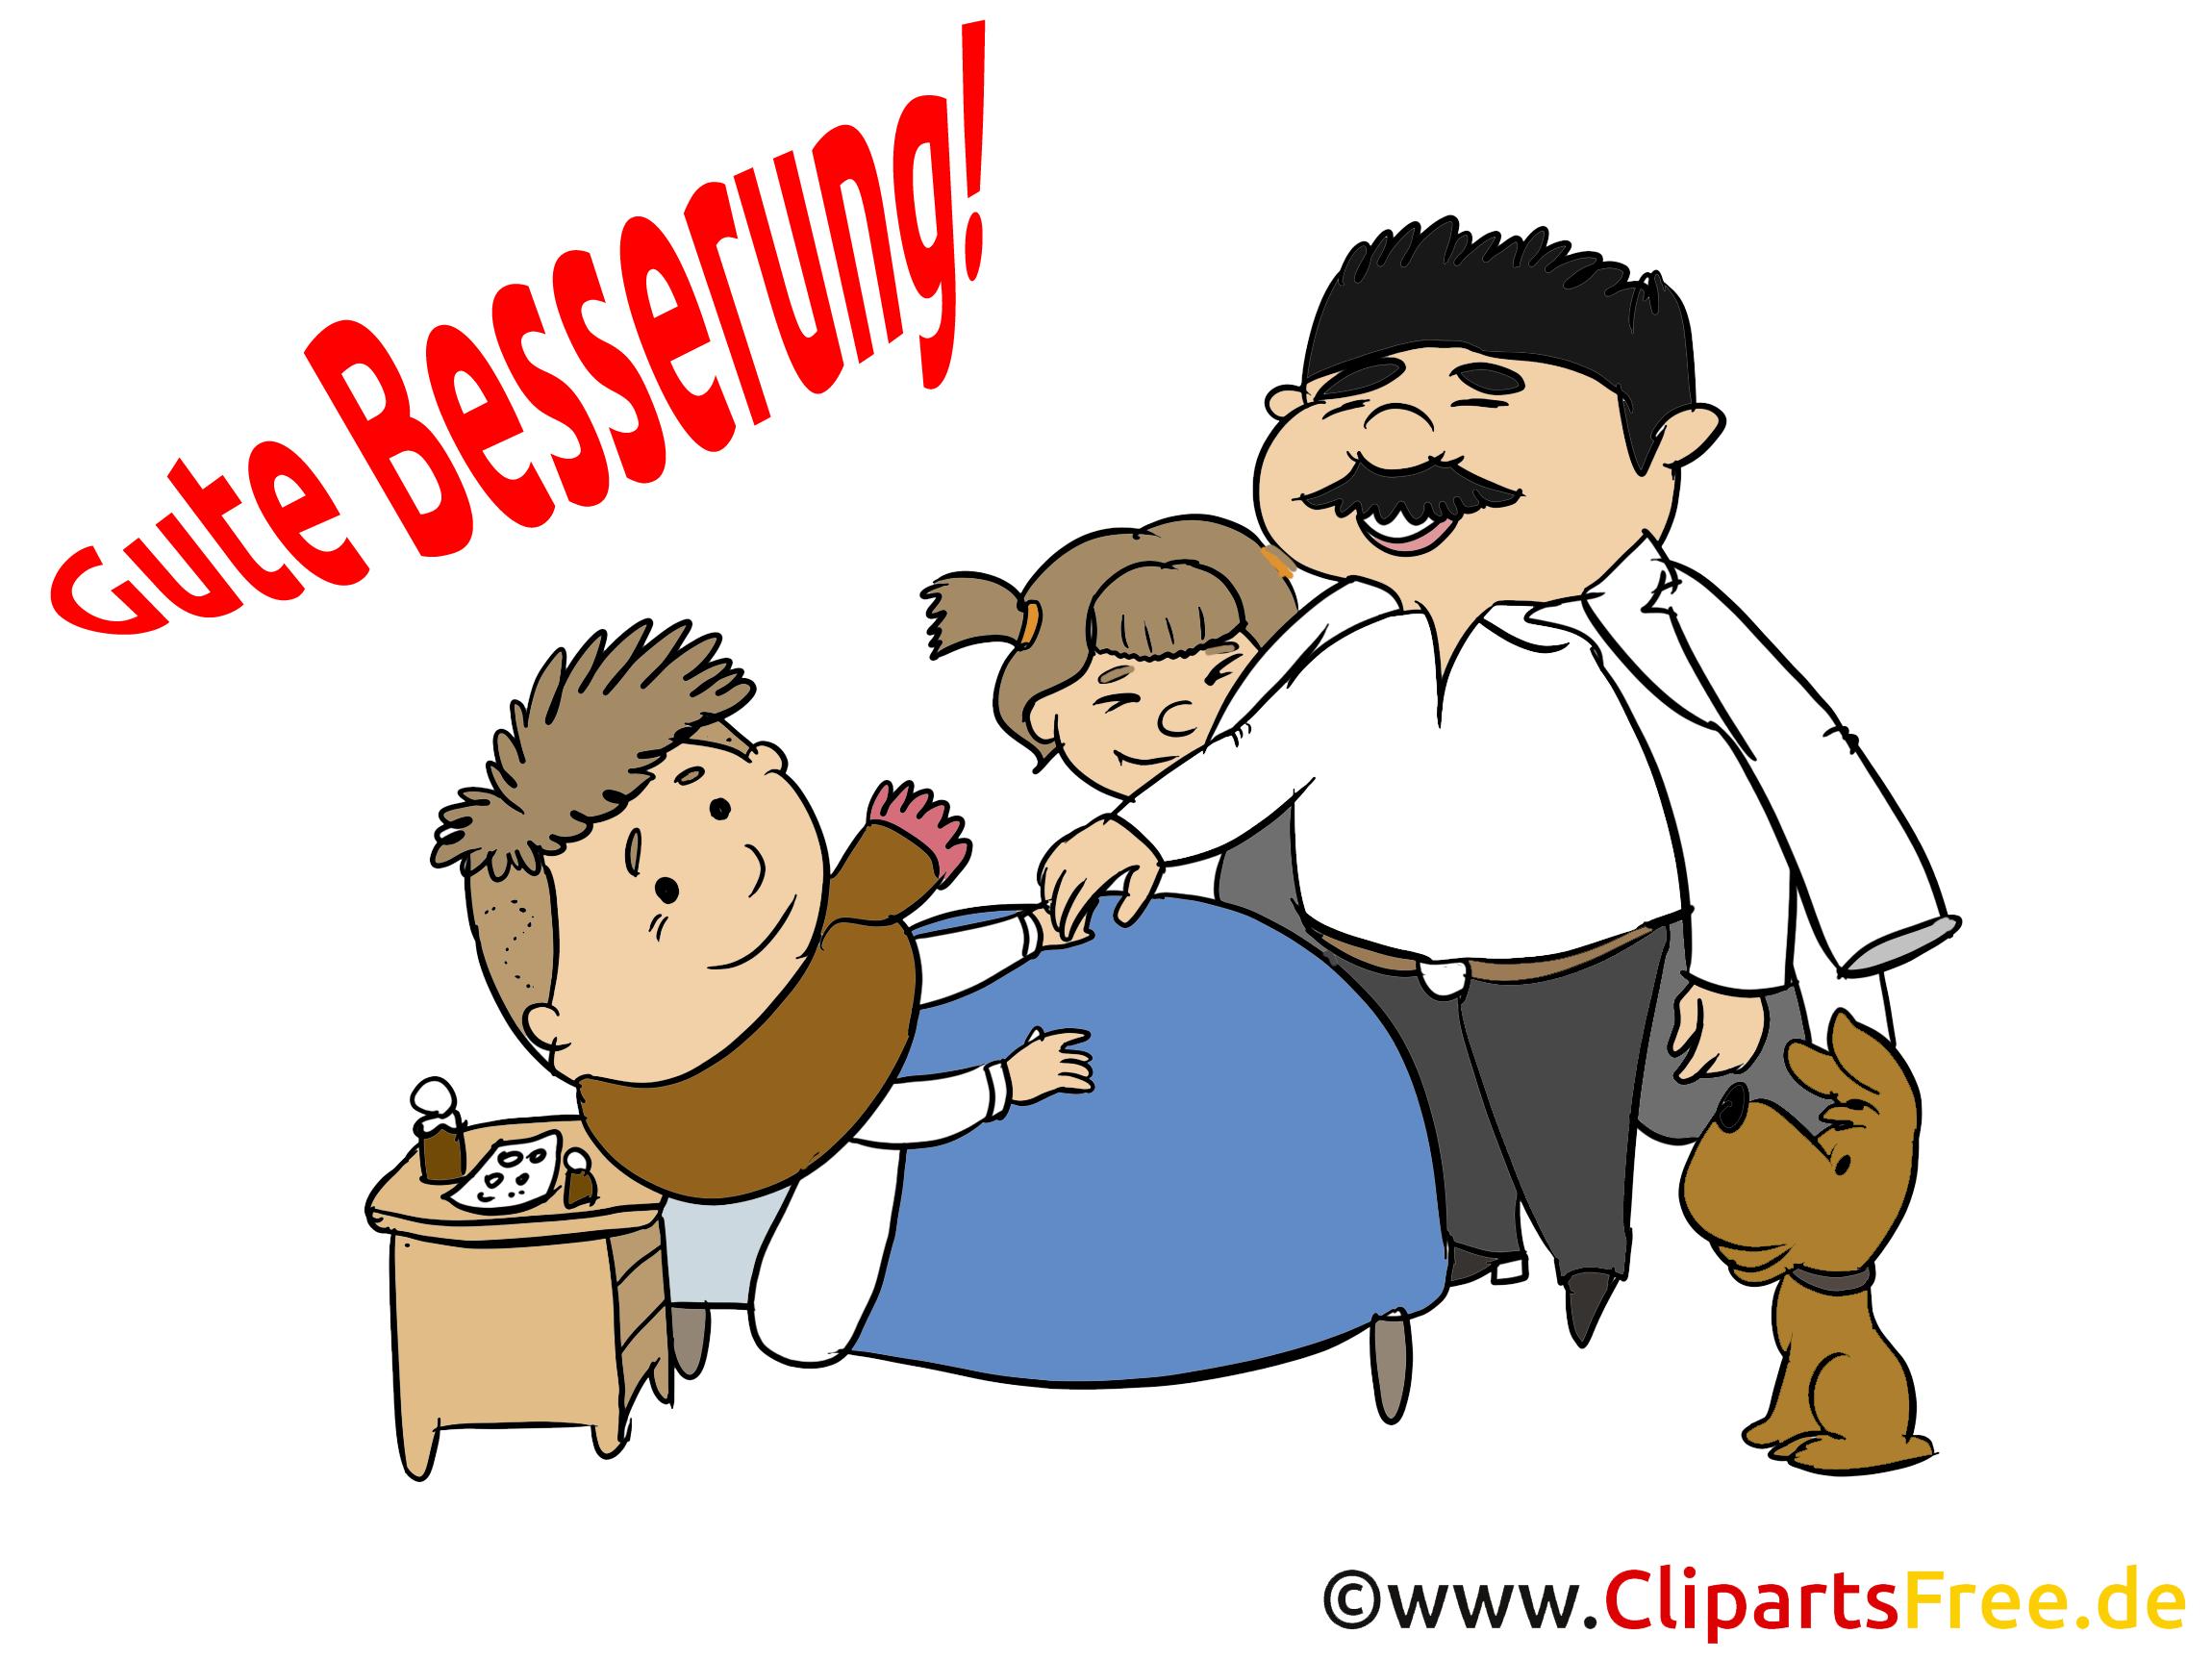 Patient im Krankenhaus Clipart, Illustration, Cartoon